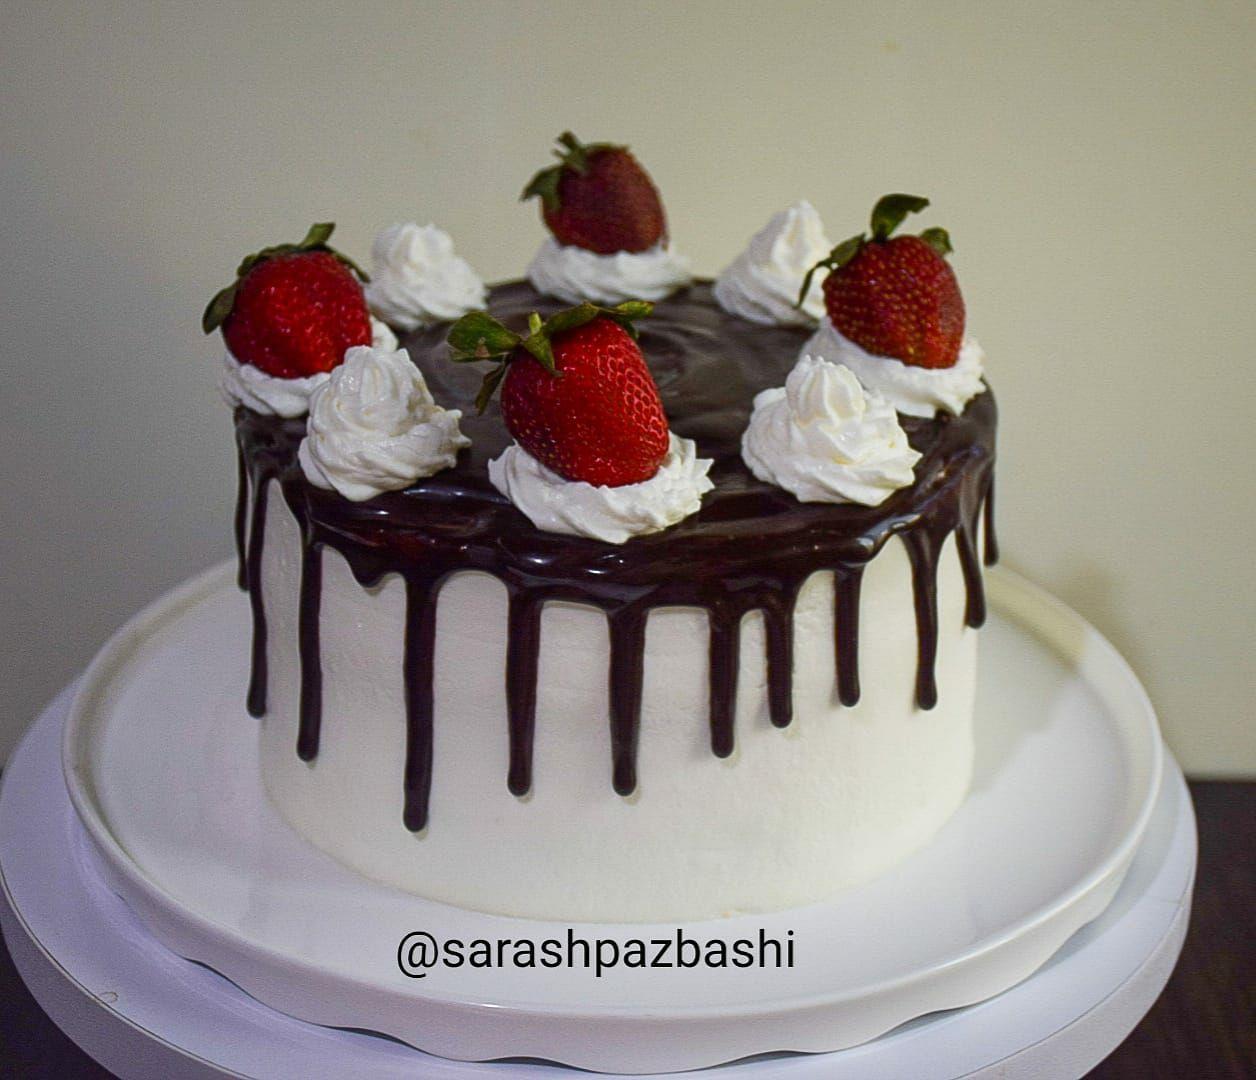 دریپ کیک